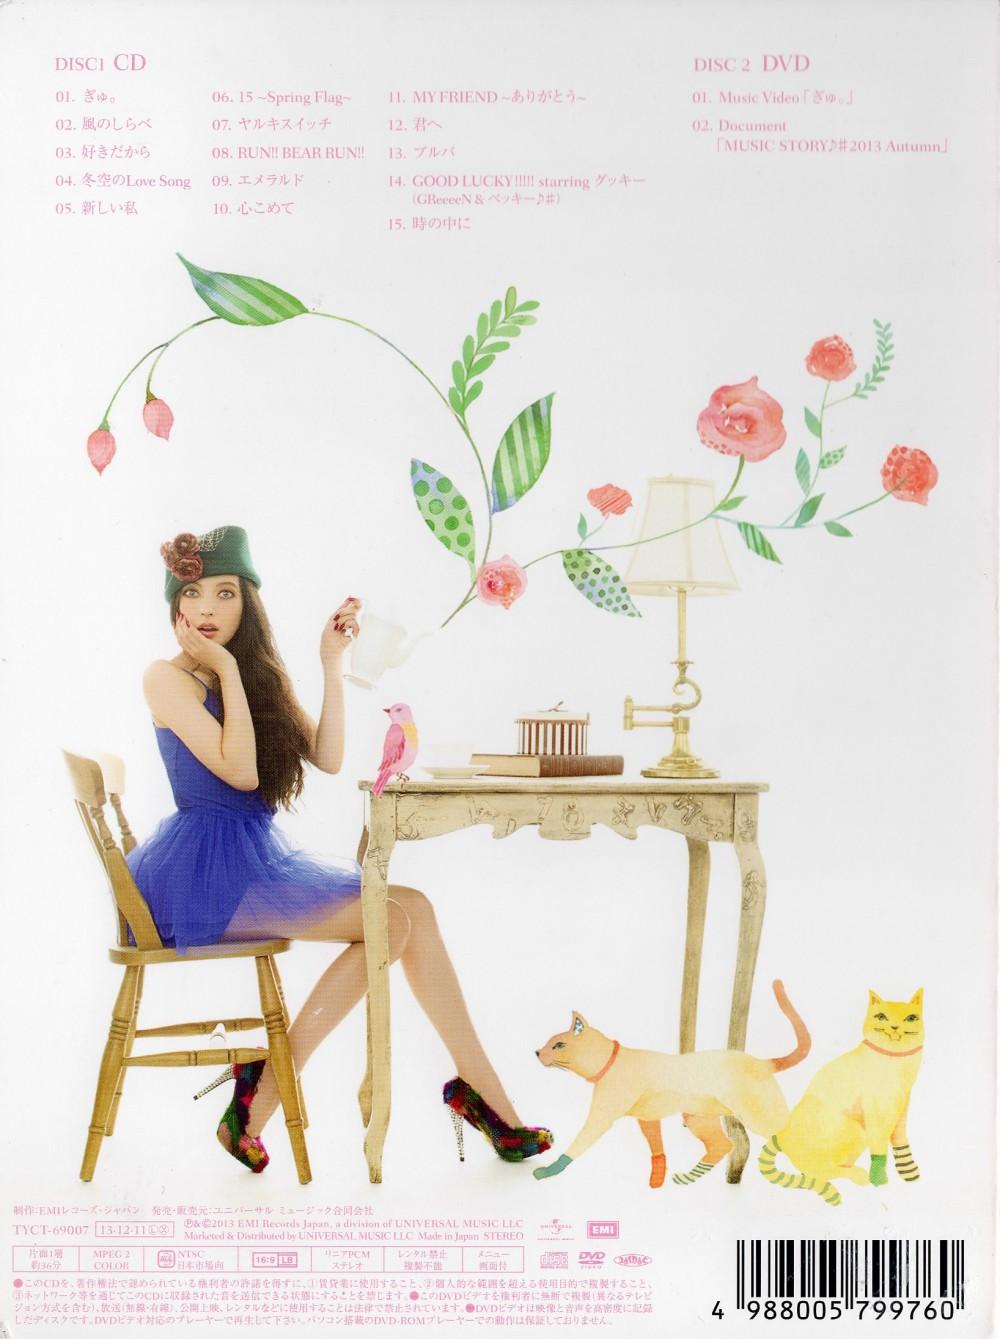 3SHINE! ~SINGLES & MORE~, special edition